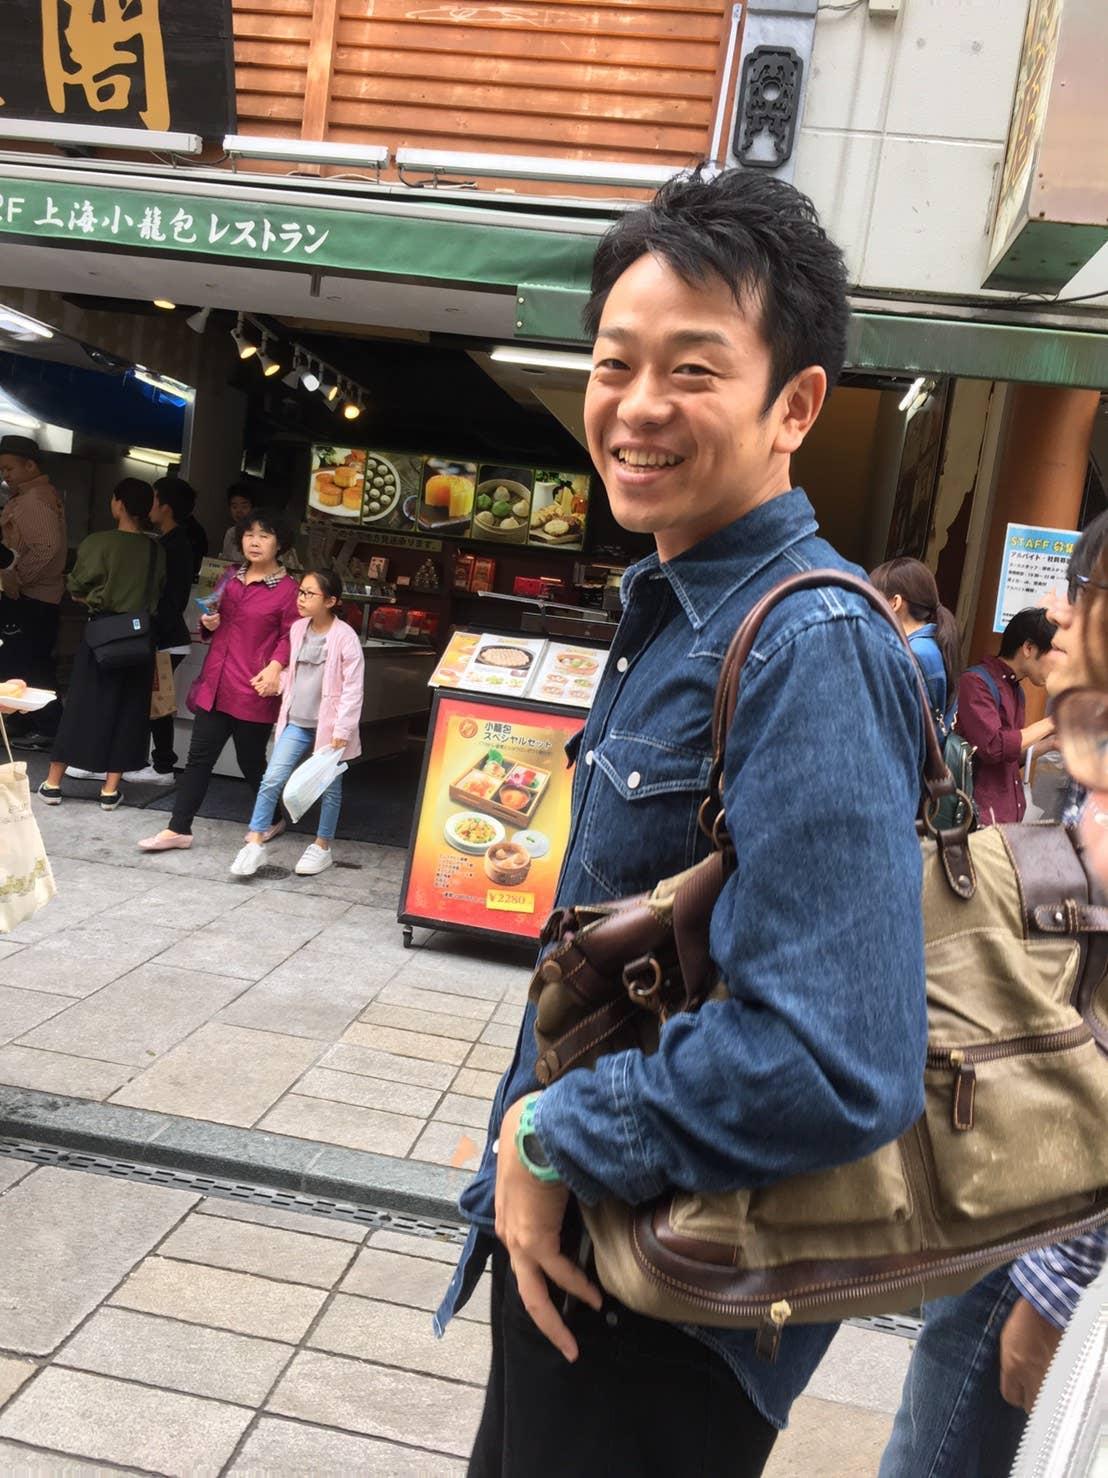 Takuya Komuro